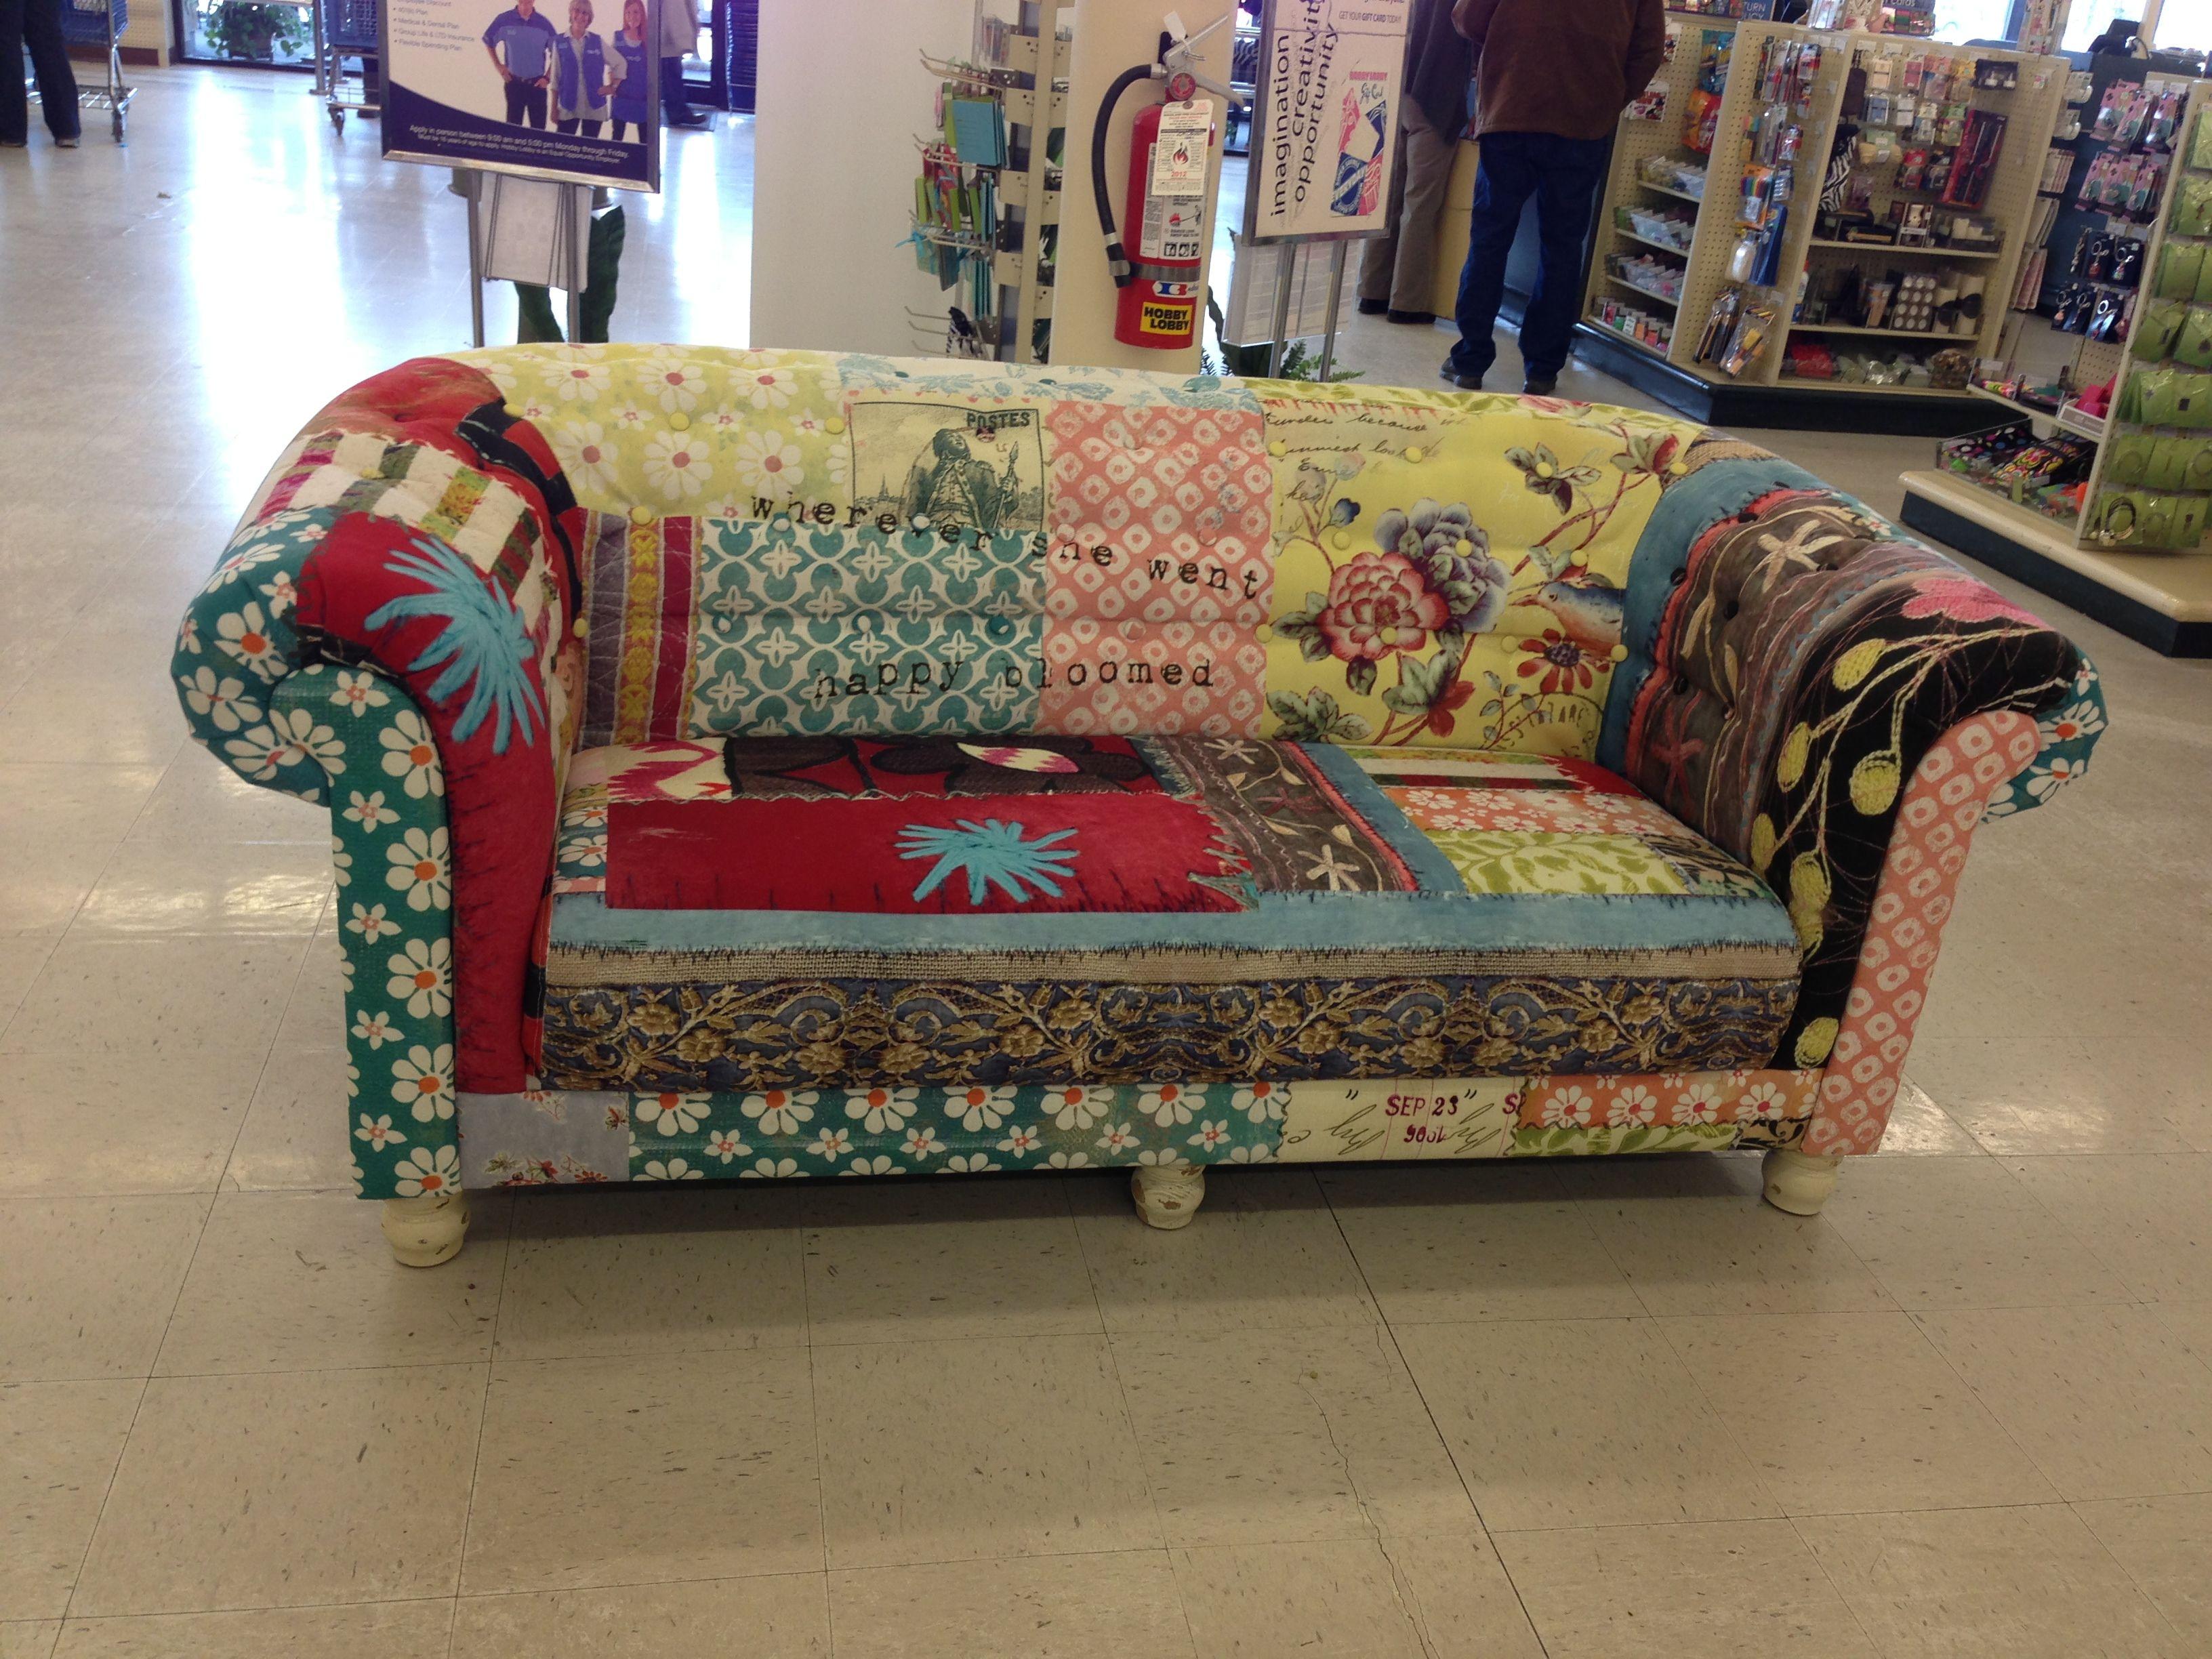 patchwork sofa amazing homes pinterest. Black Bedroom Furniture Sets. Home Design Ideas